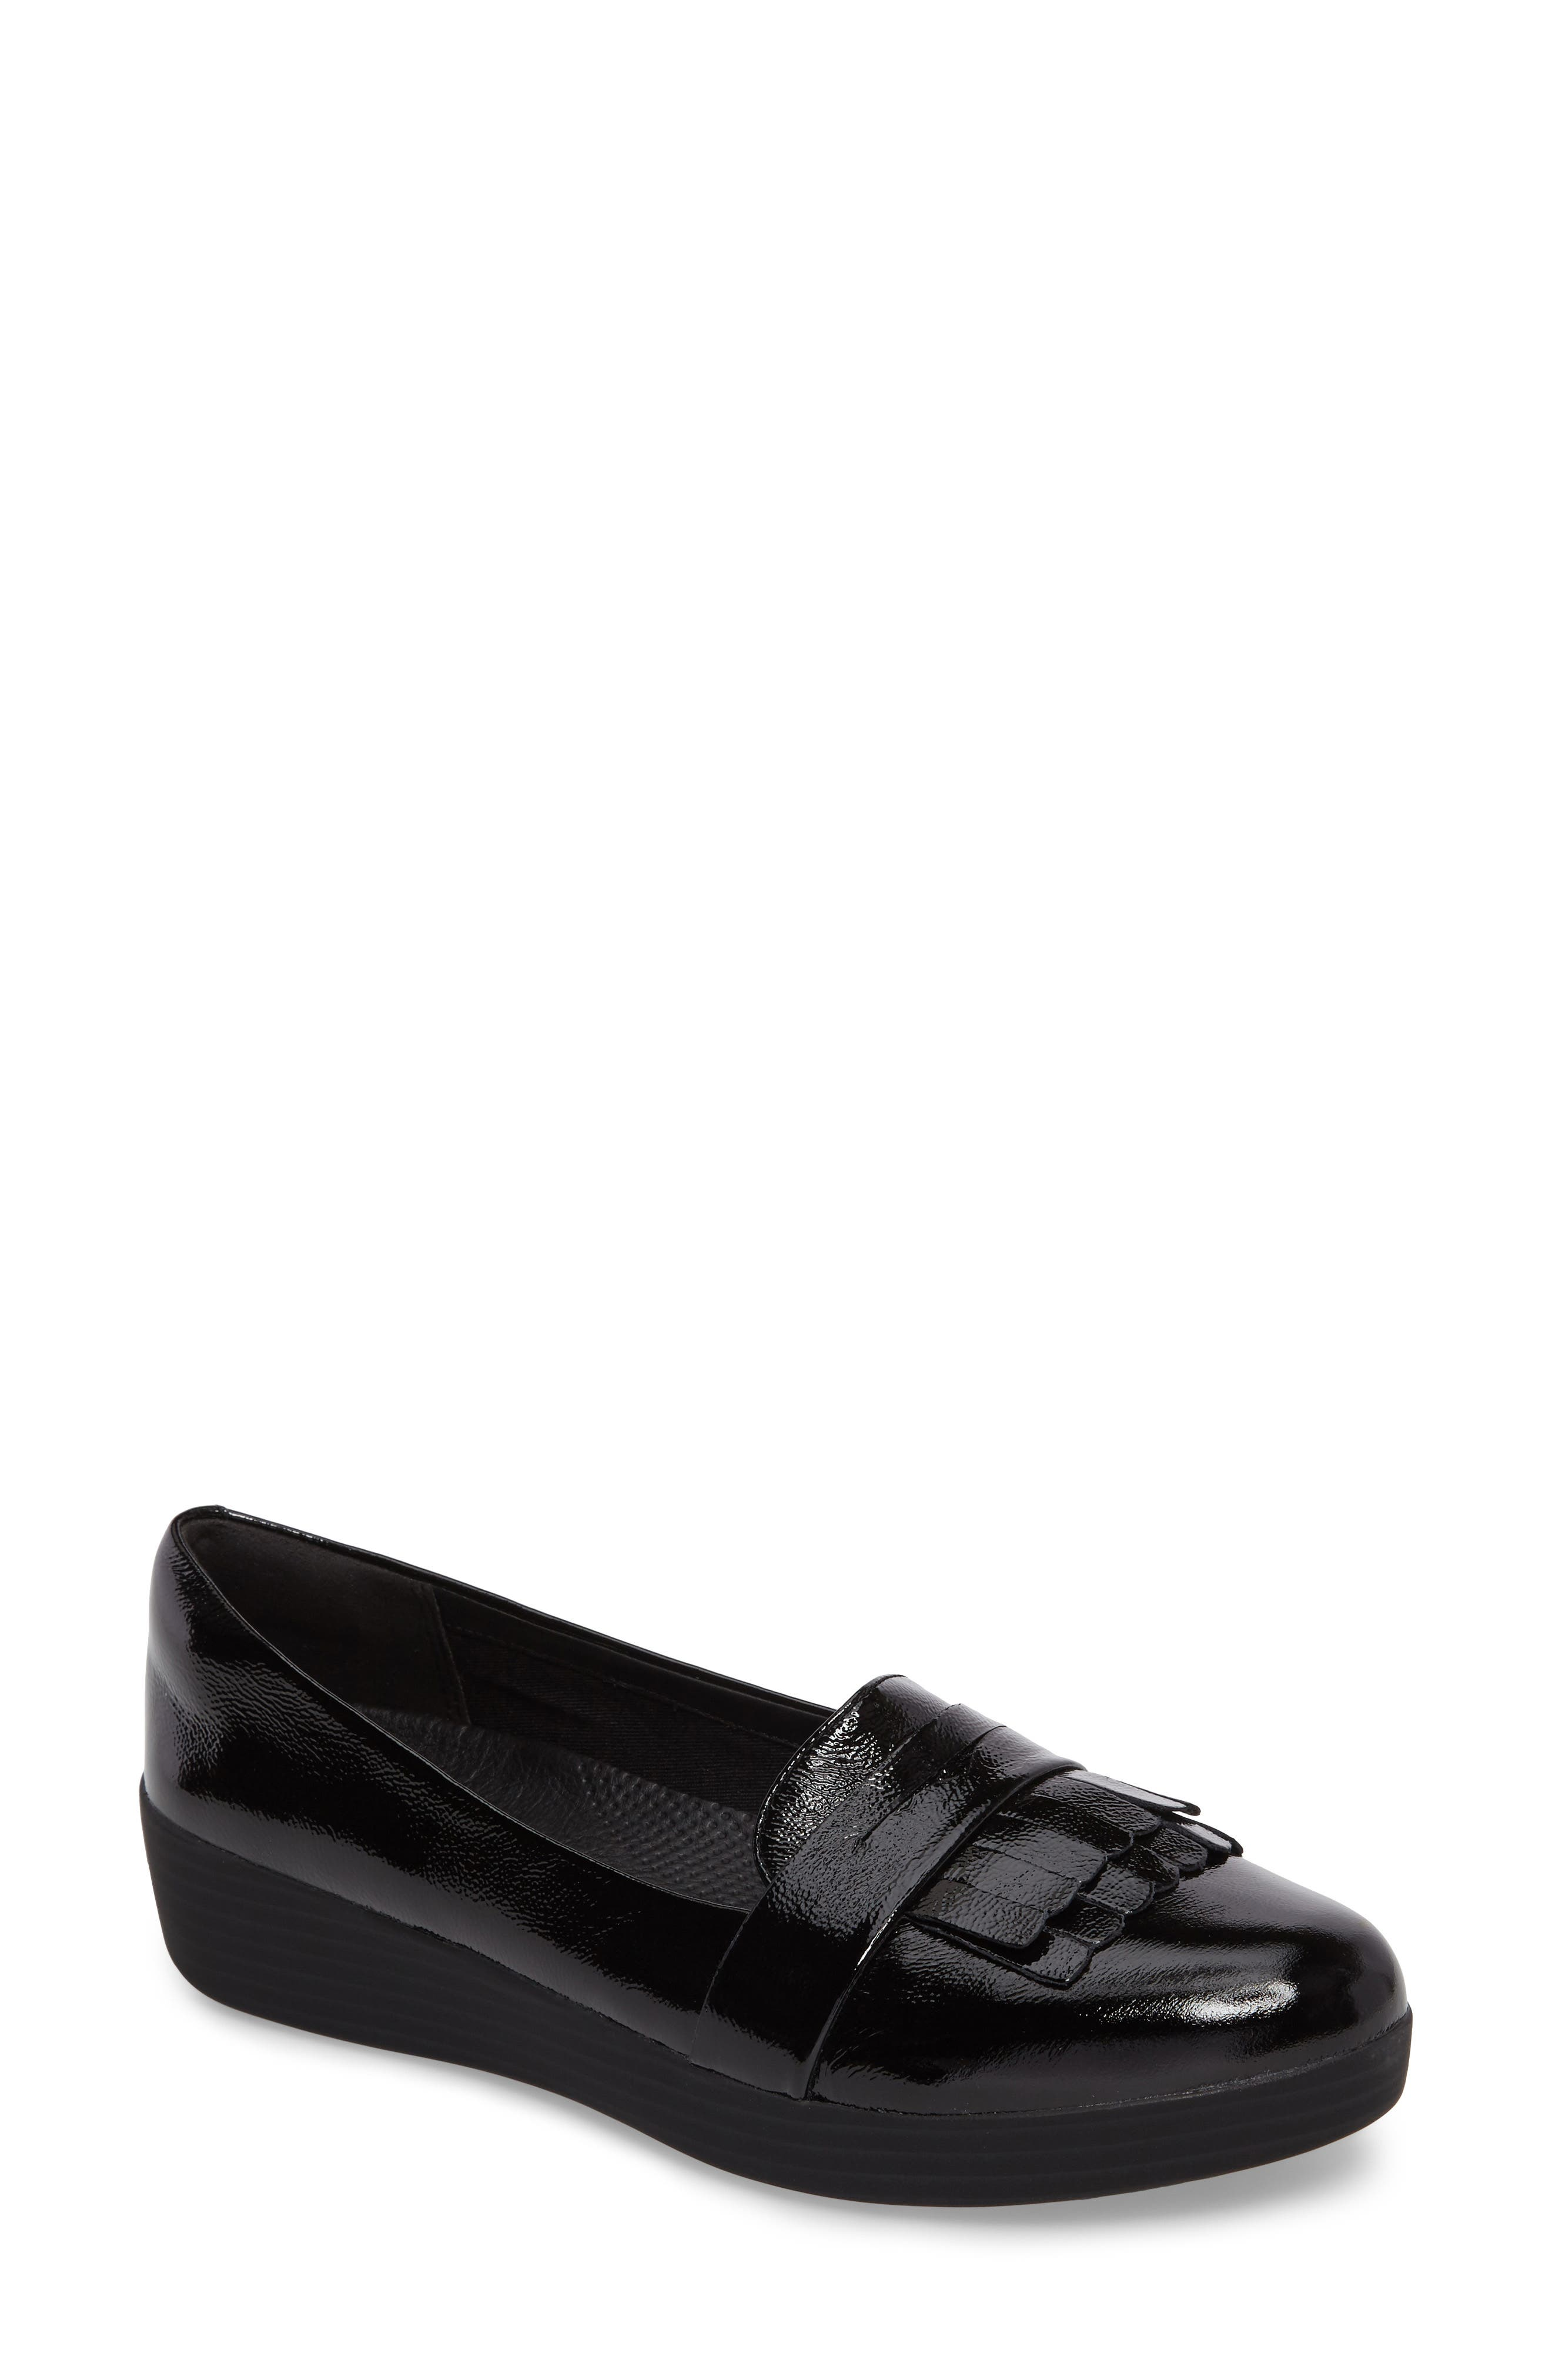 Alternate Image 1 Selected - FitFlop™ Fringey Sneakerloafer Slip-On (Women)